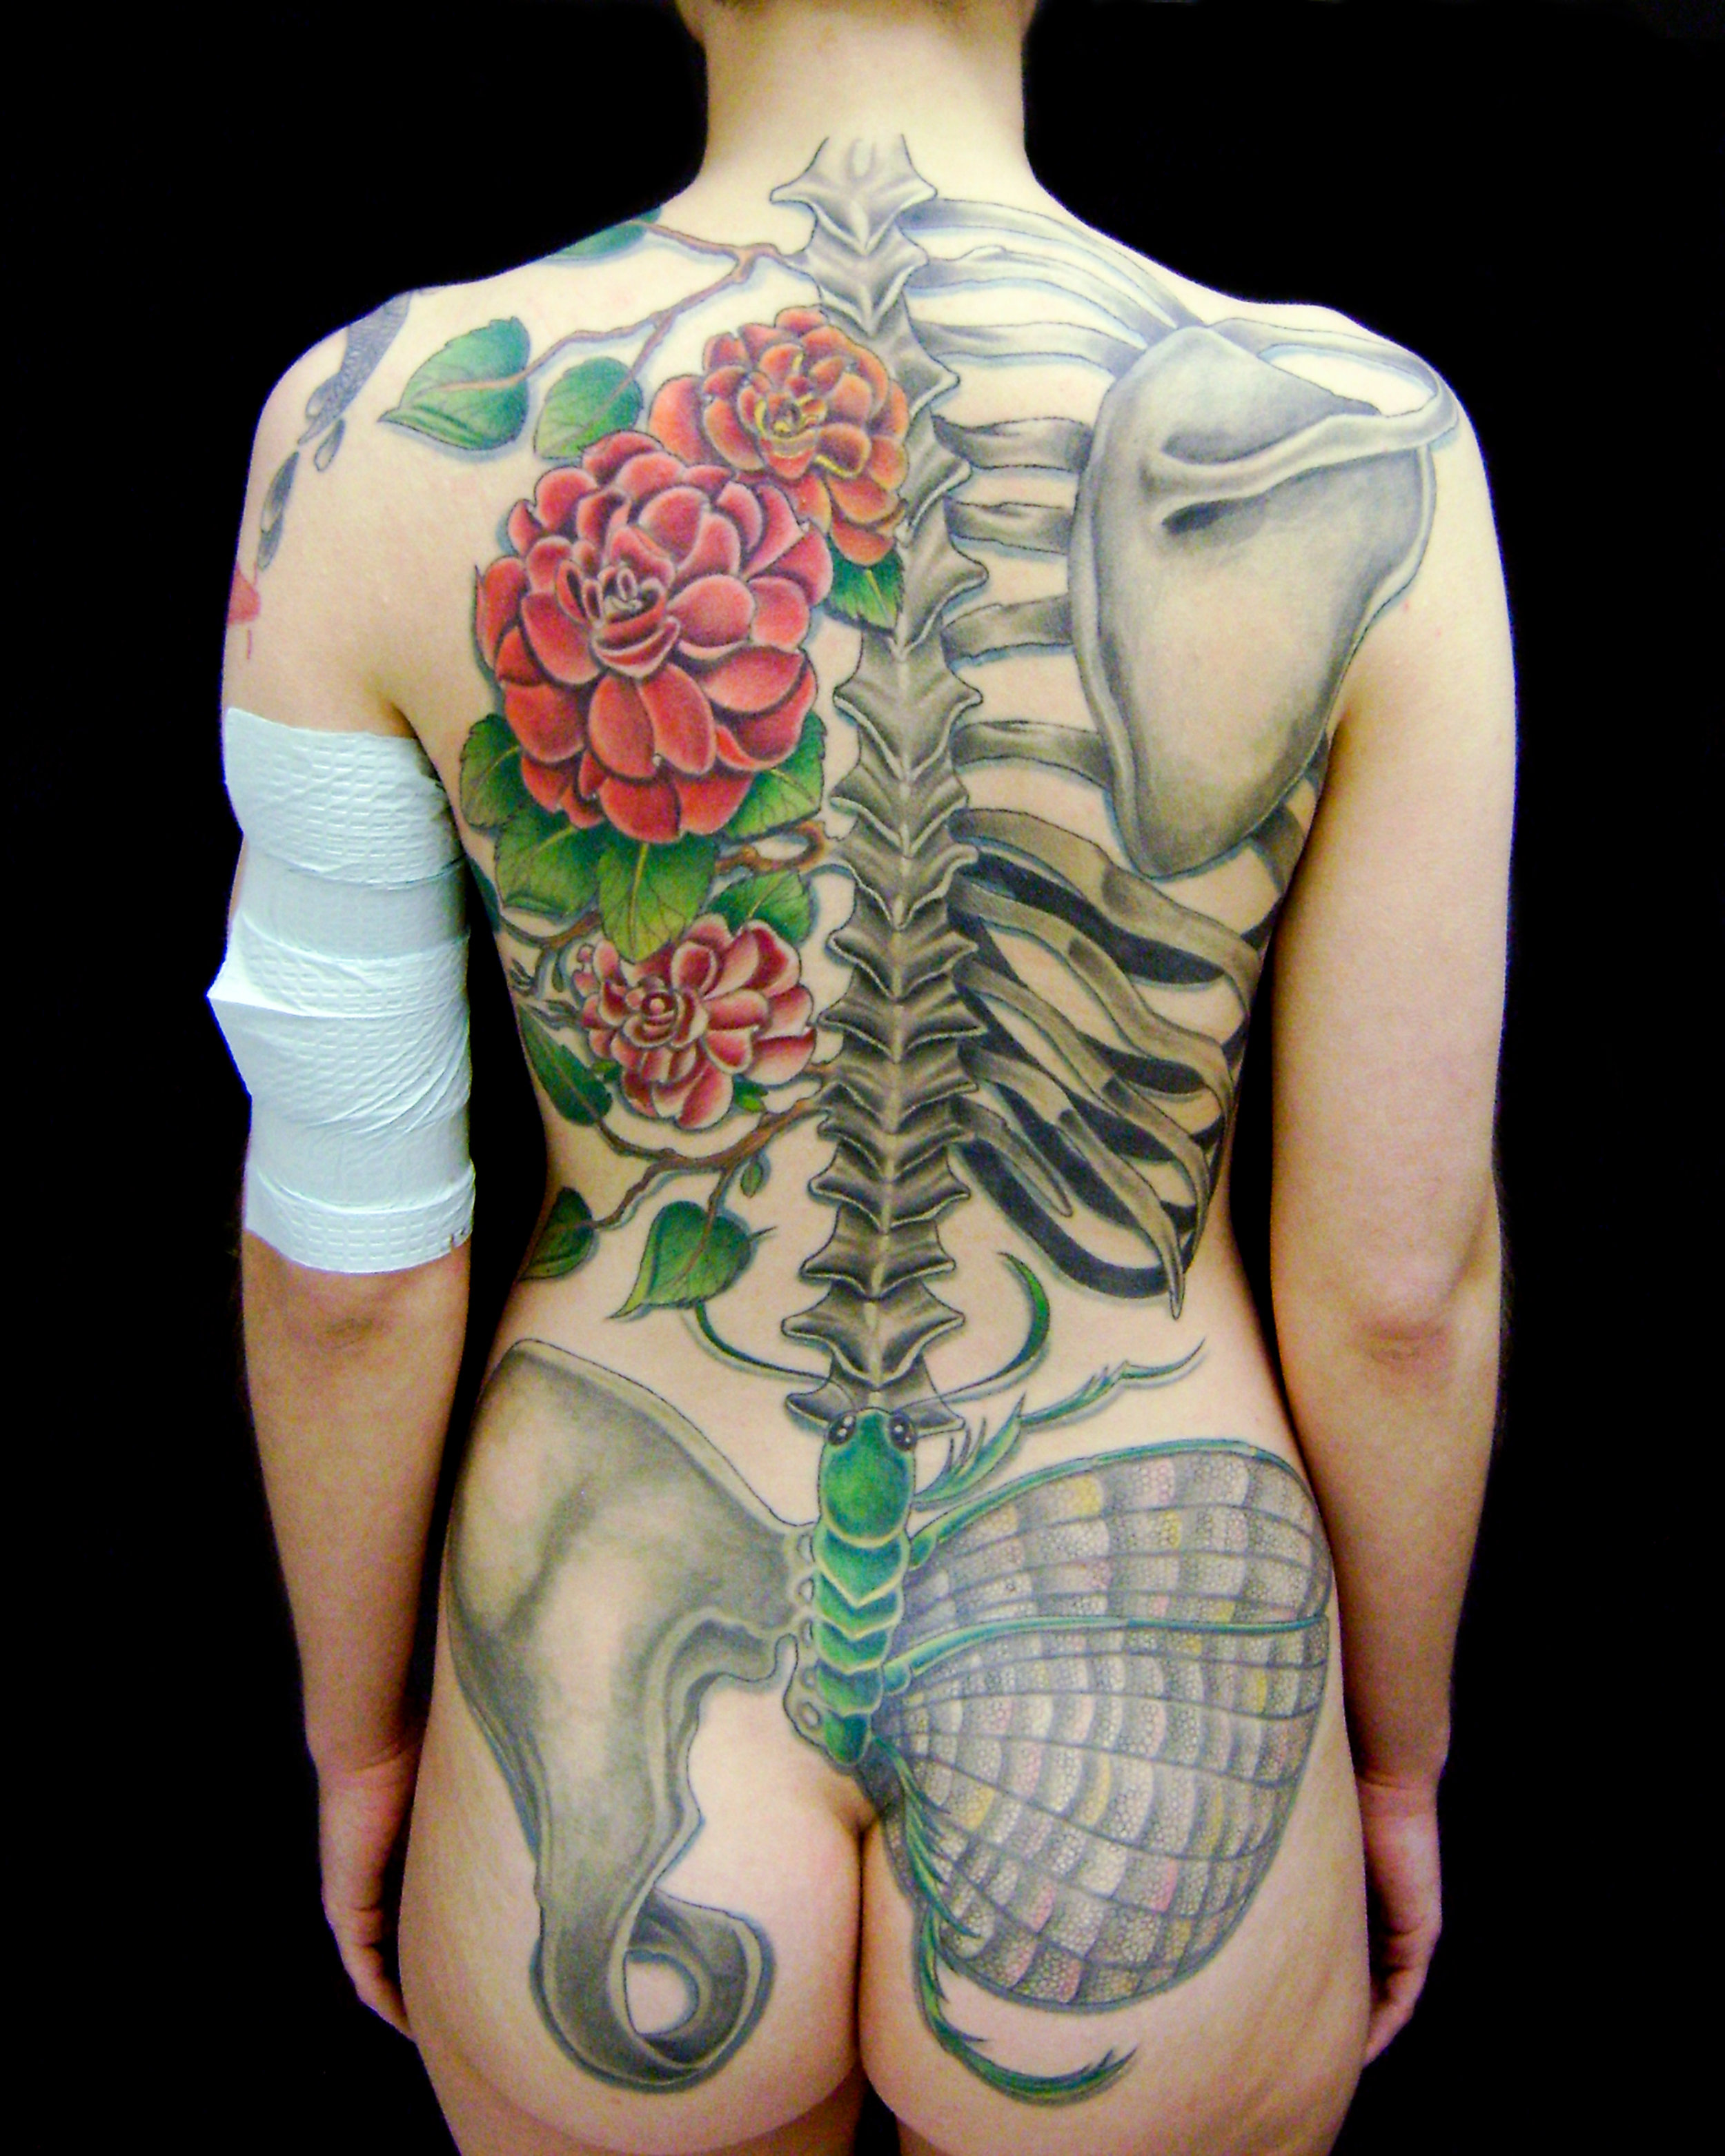 Atlanta Tattoo Artist James Cooper